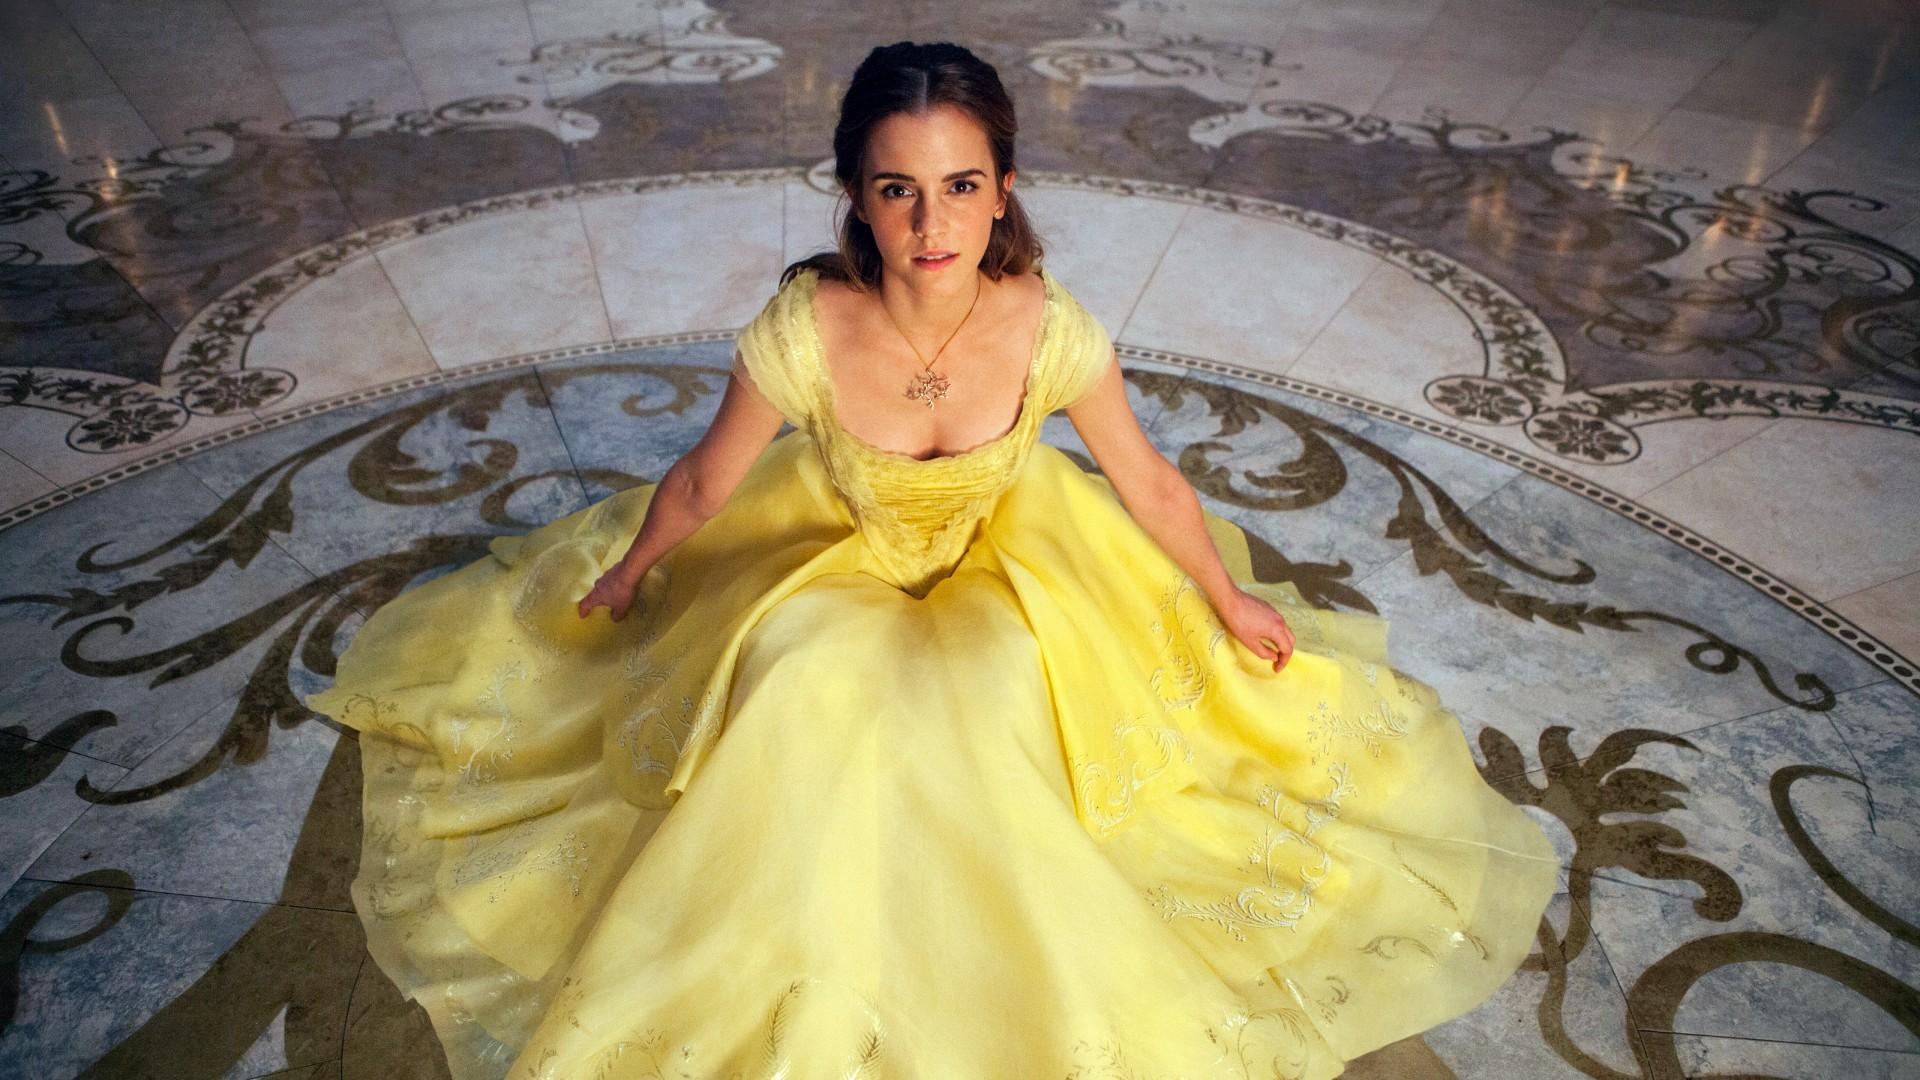 Emma Watson Belle Beauty and the Beast Wallpapers  HD